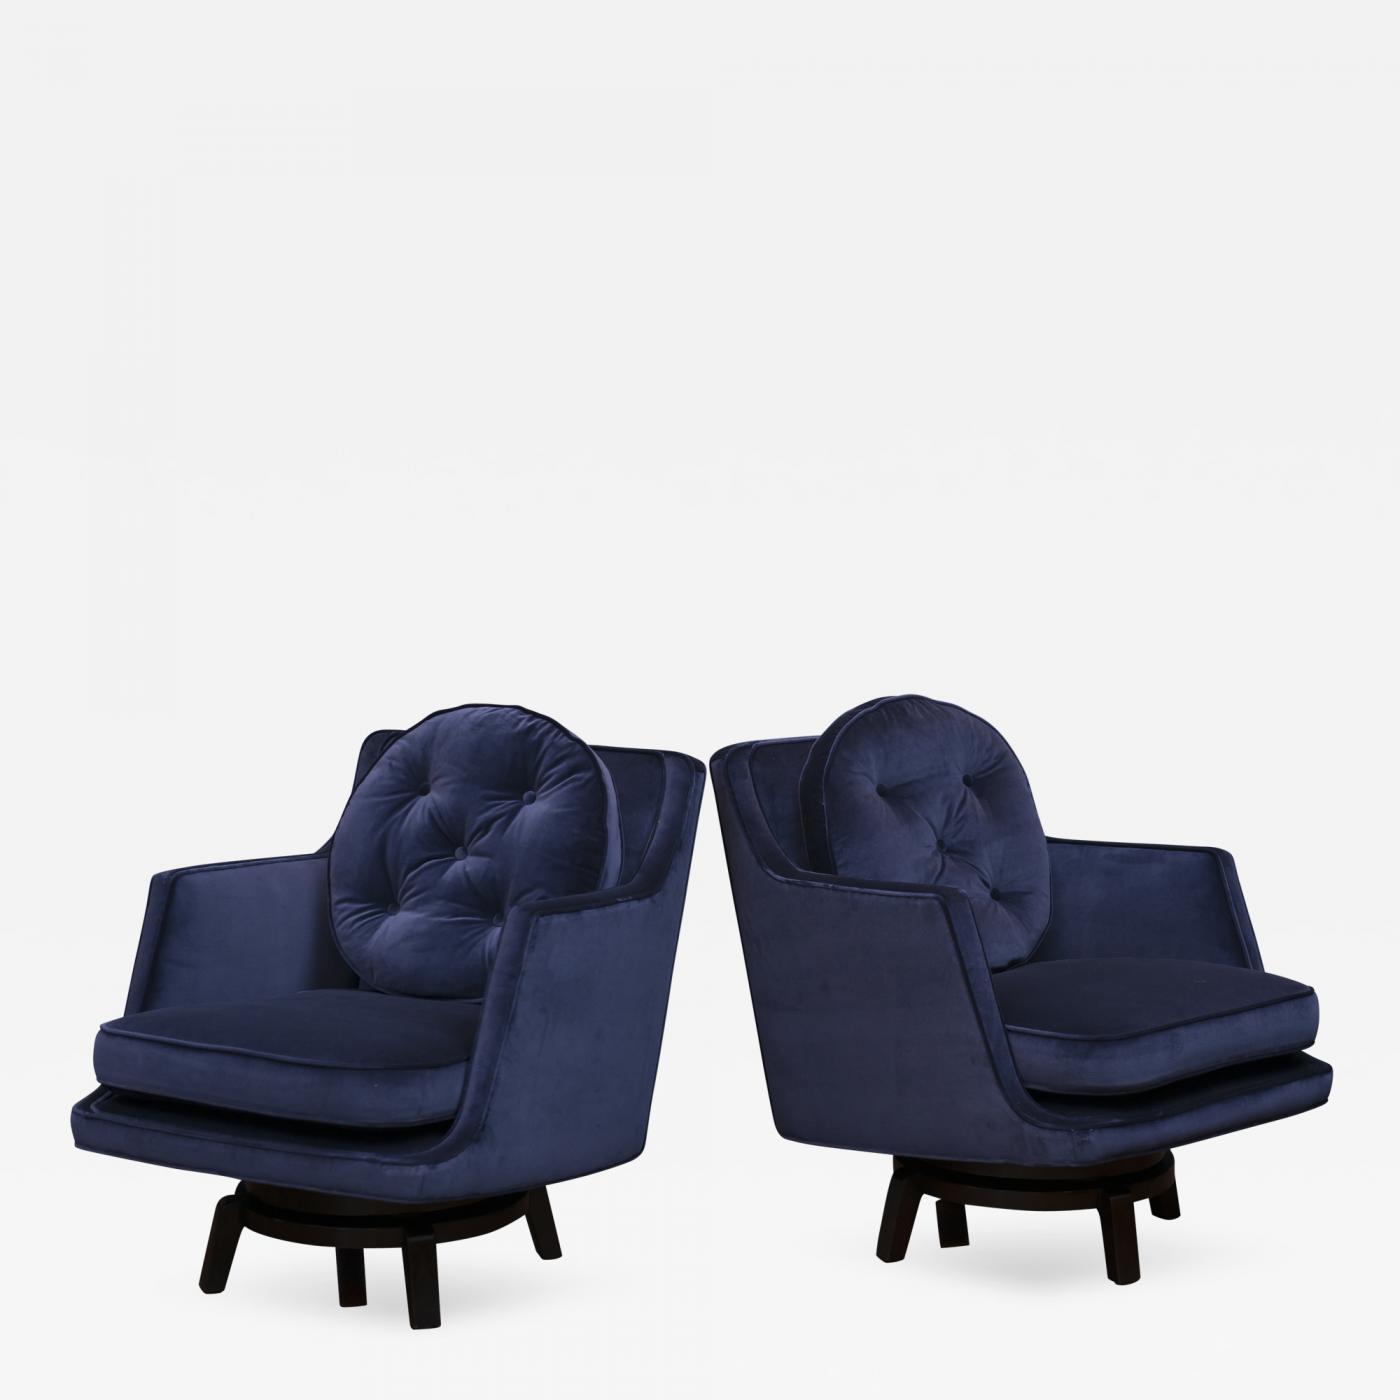 Edward wormley dunbar swivel lounge chairs - Edward wormley chairs ...